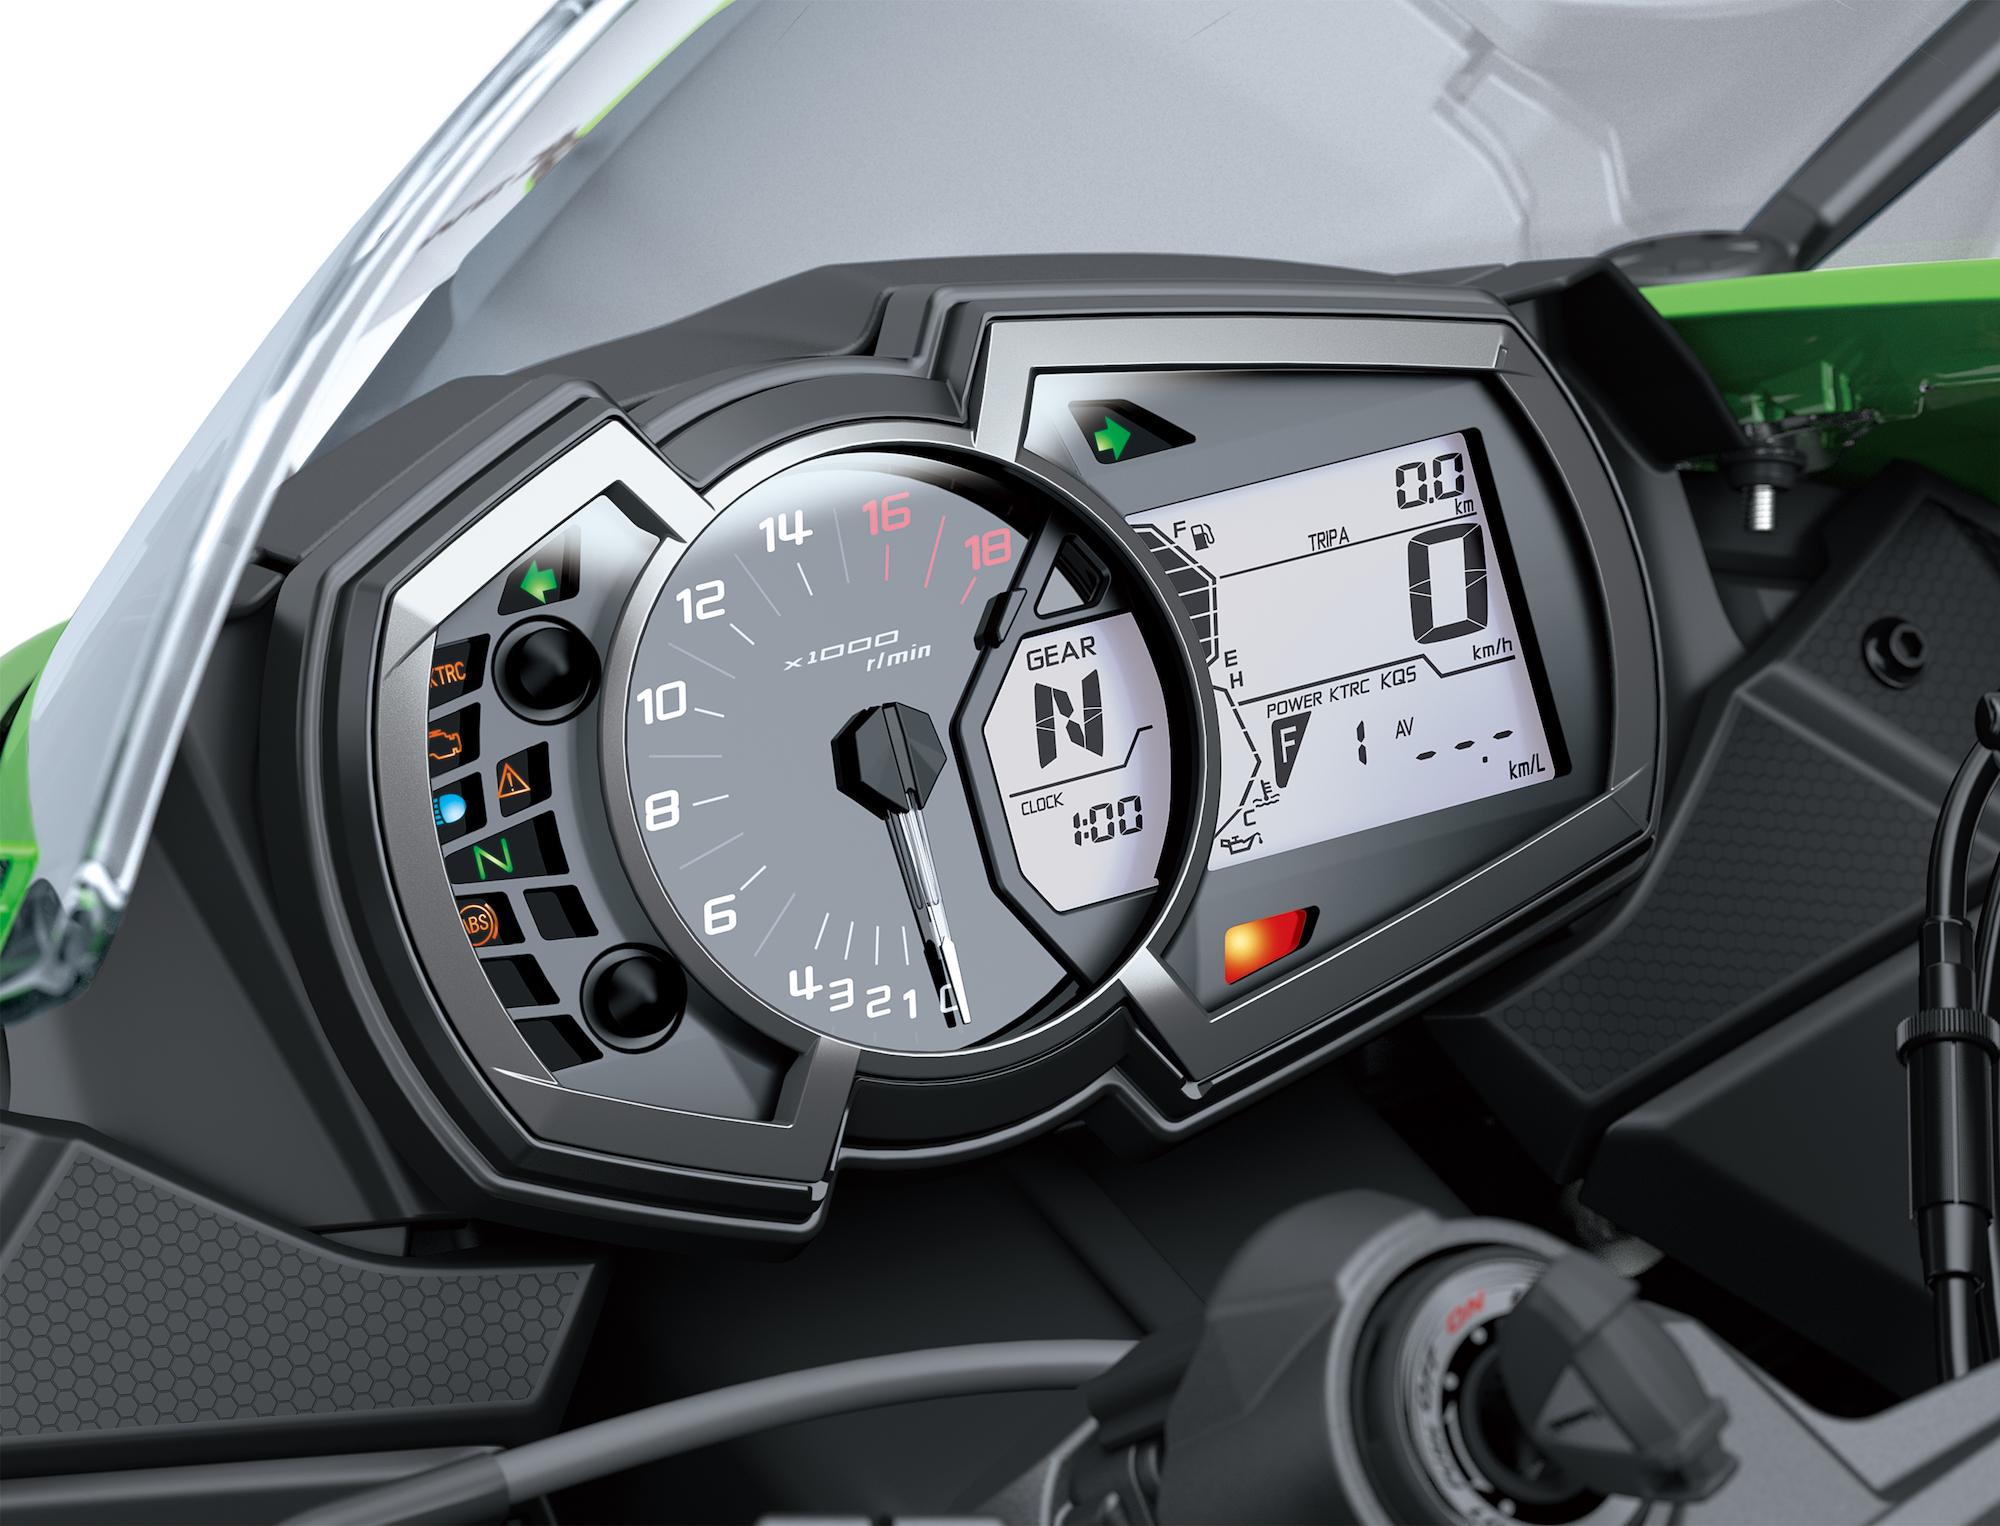 Kawasaki Announces New Zx 6r 636 For 2019 Zx6r Forum